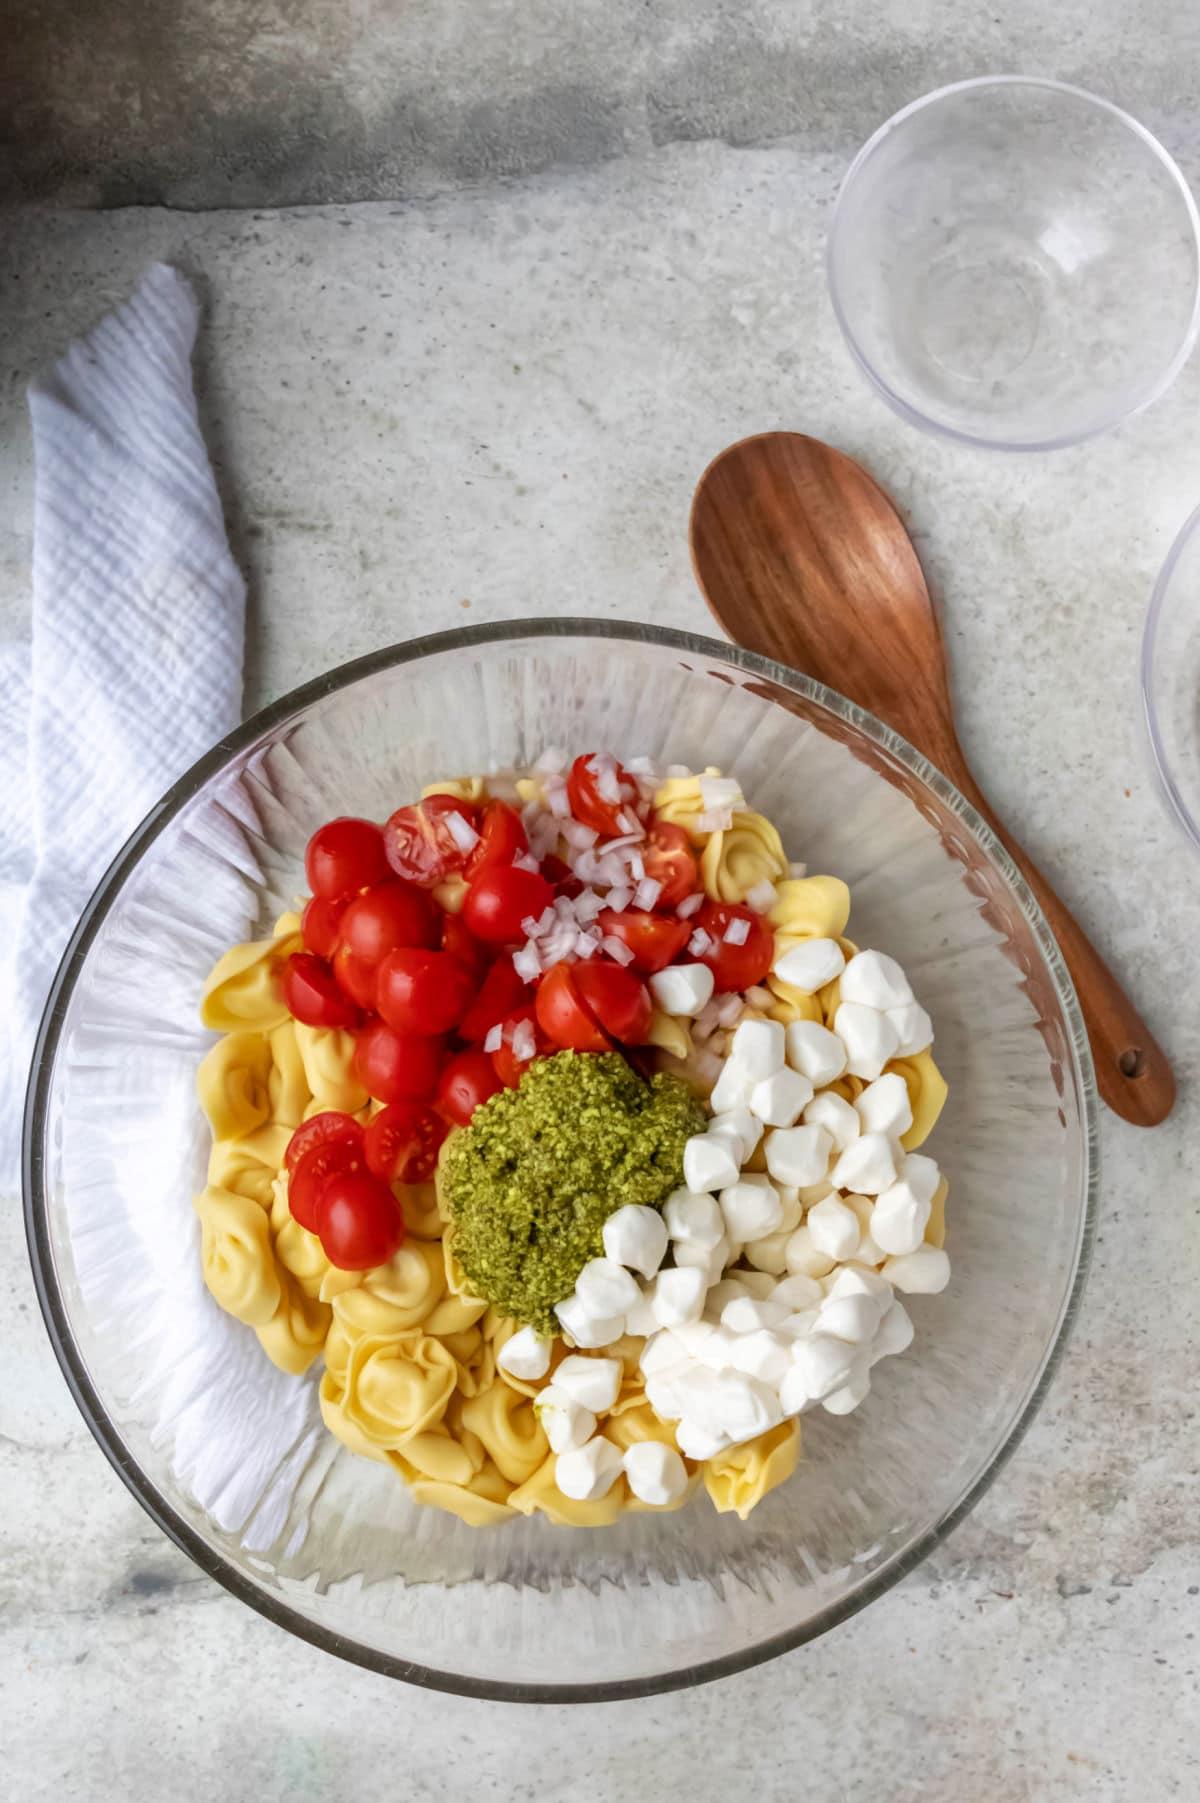 Pesto tortellini pasta salad ingredients in a glass mixing bowl.